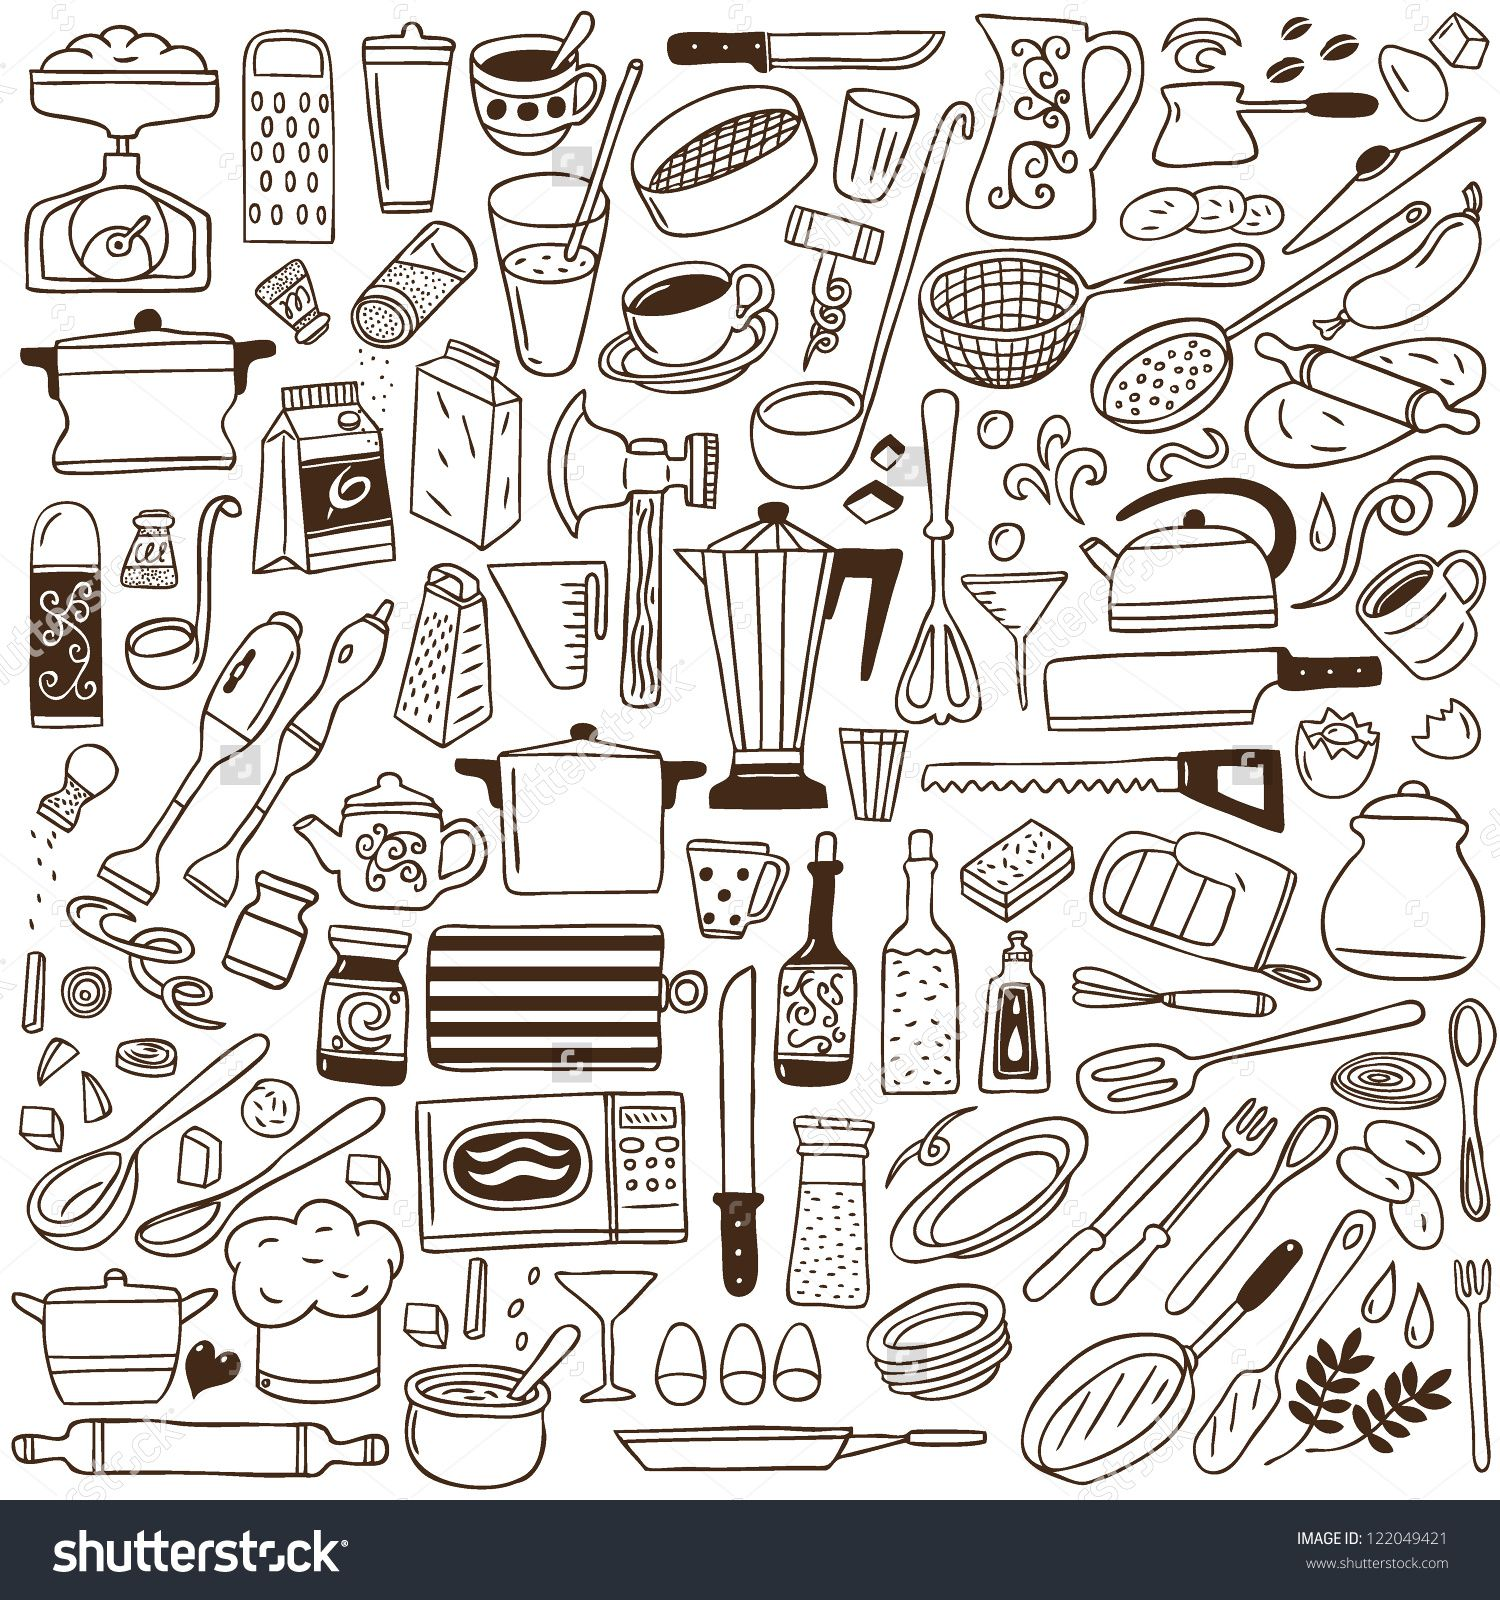 kitchen tools - doodles collection | Doodles | Pinterest | Doodles ...